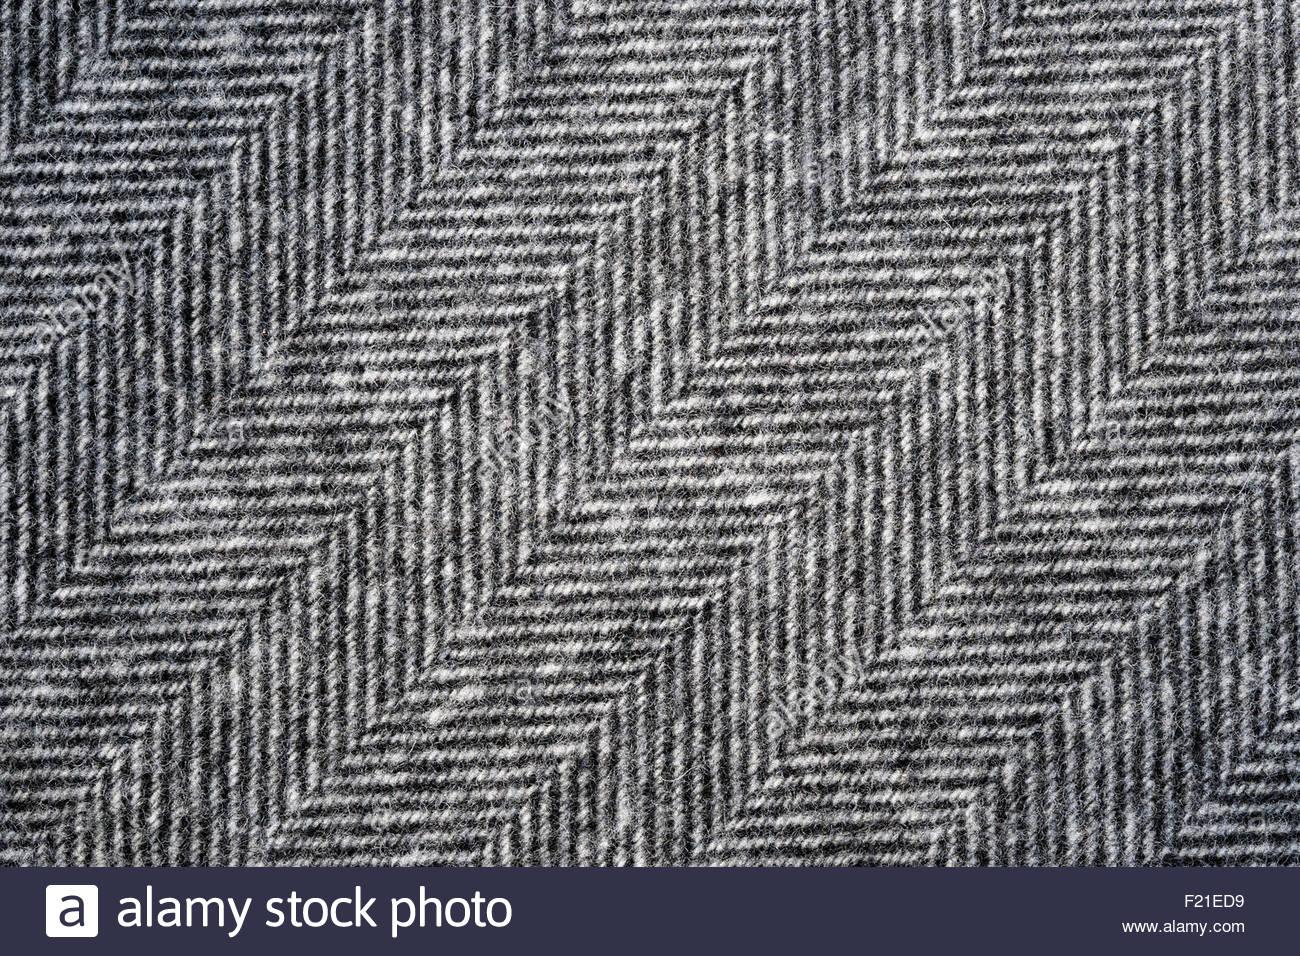 1300x956 Herringbone Tweed Background With Closeup On Wool Fabric Texture